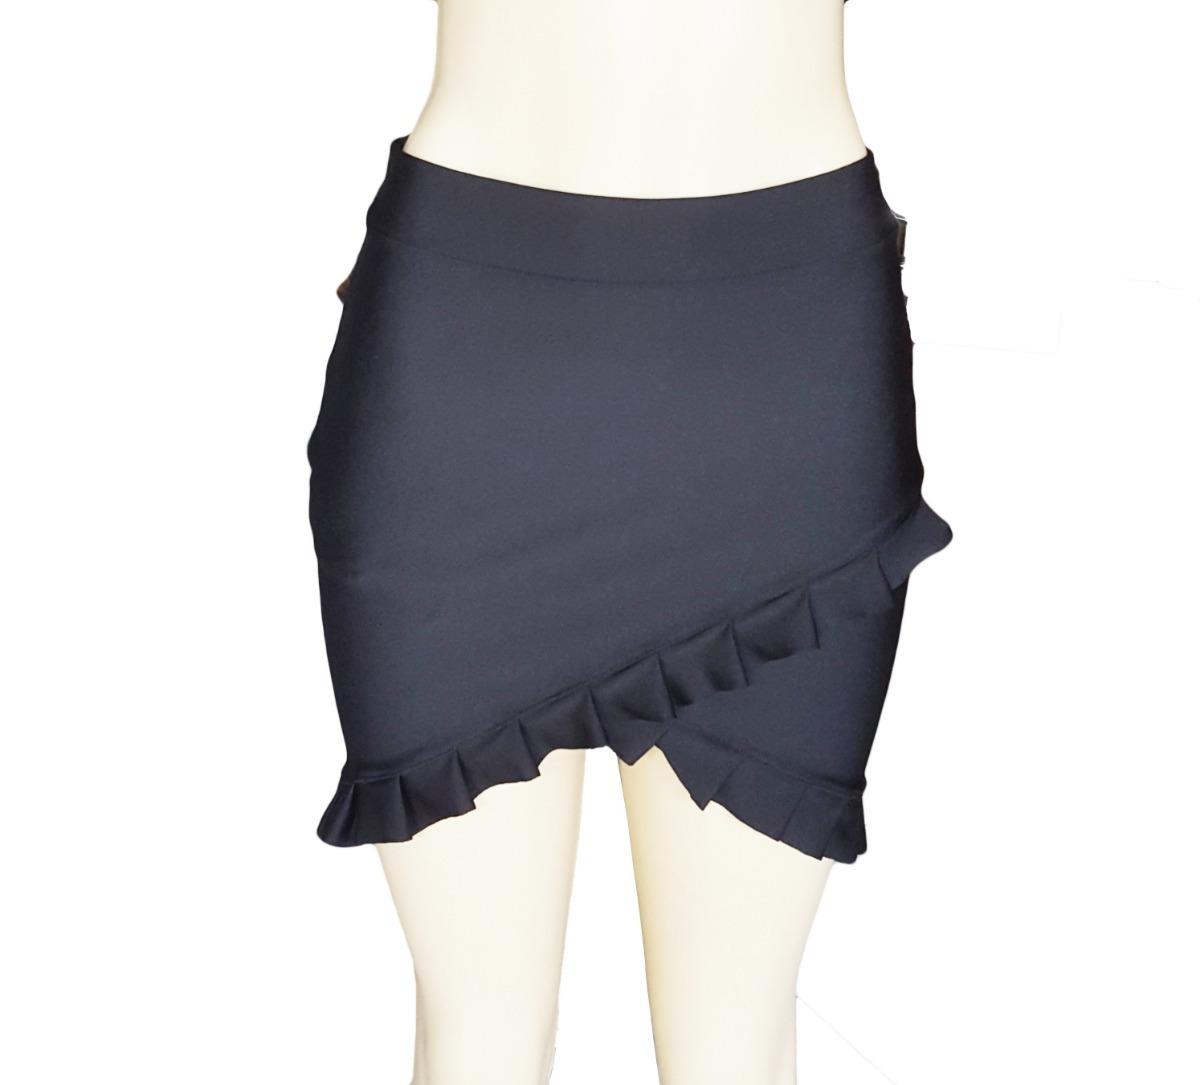 31095adacd saia feminina preta lisa media curta justa com babado roupas. Carregando  zoom.